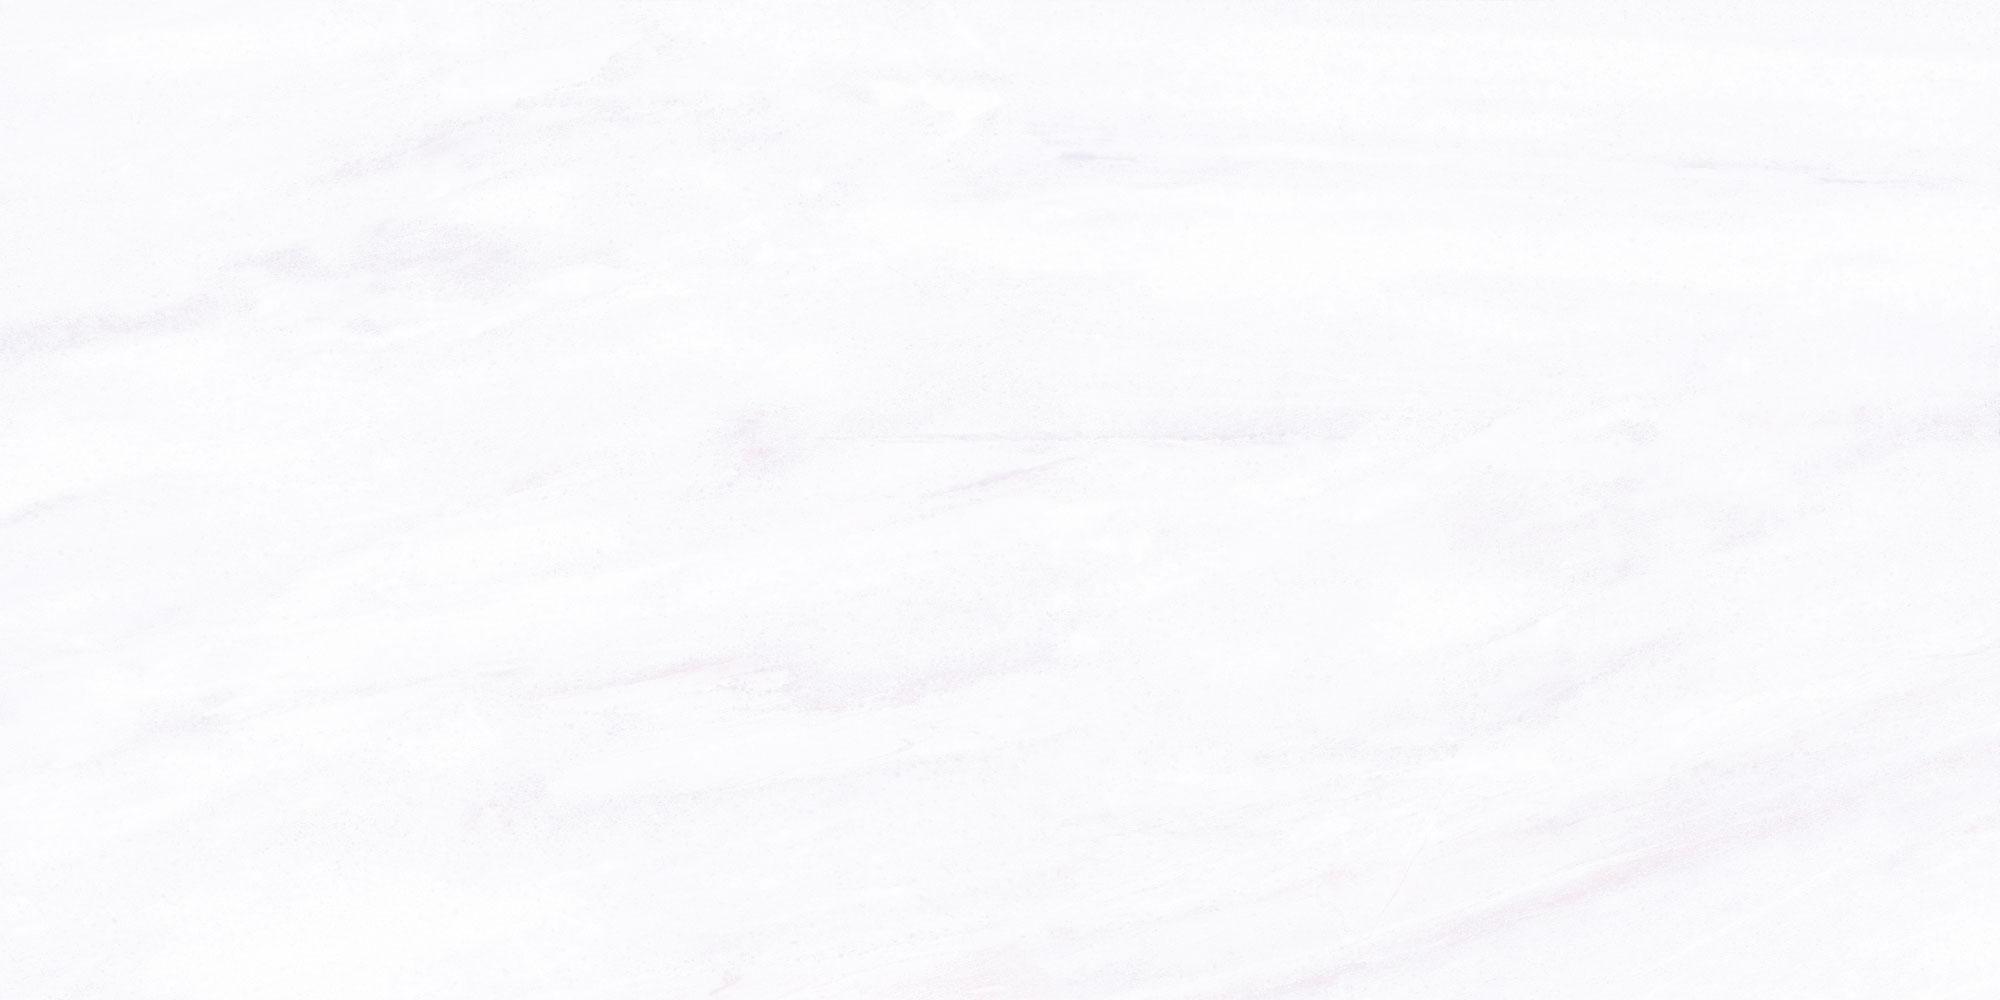 Cinque Triest Cremeweiß Marmoriert 60x120 Boden-/Wandfliese Poliert